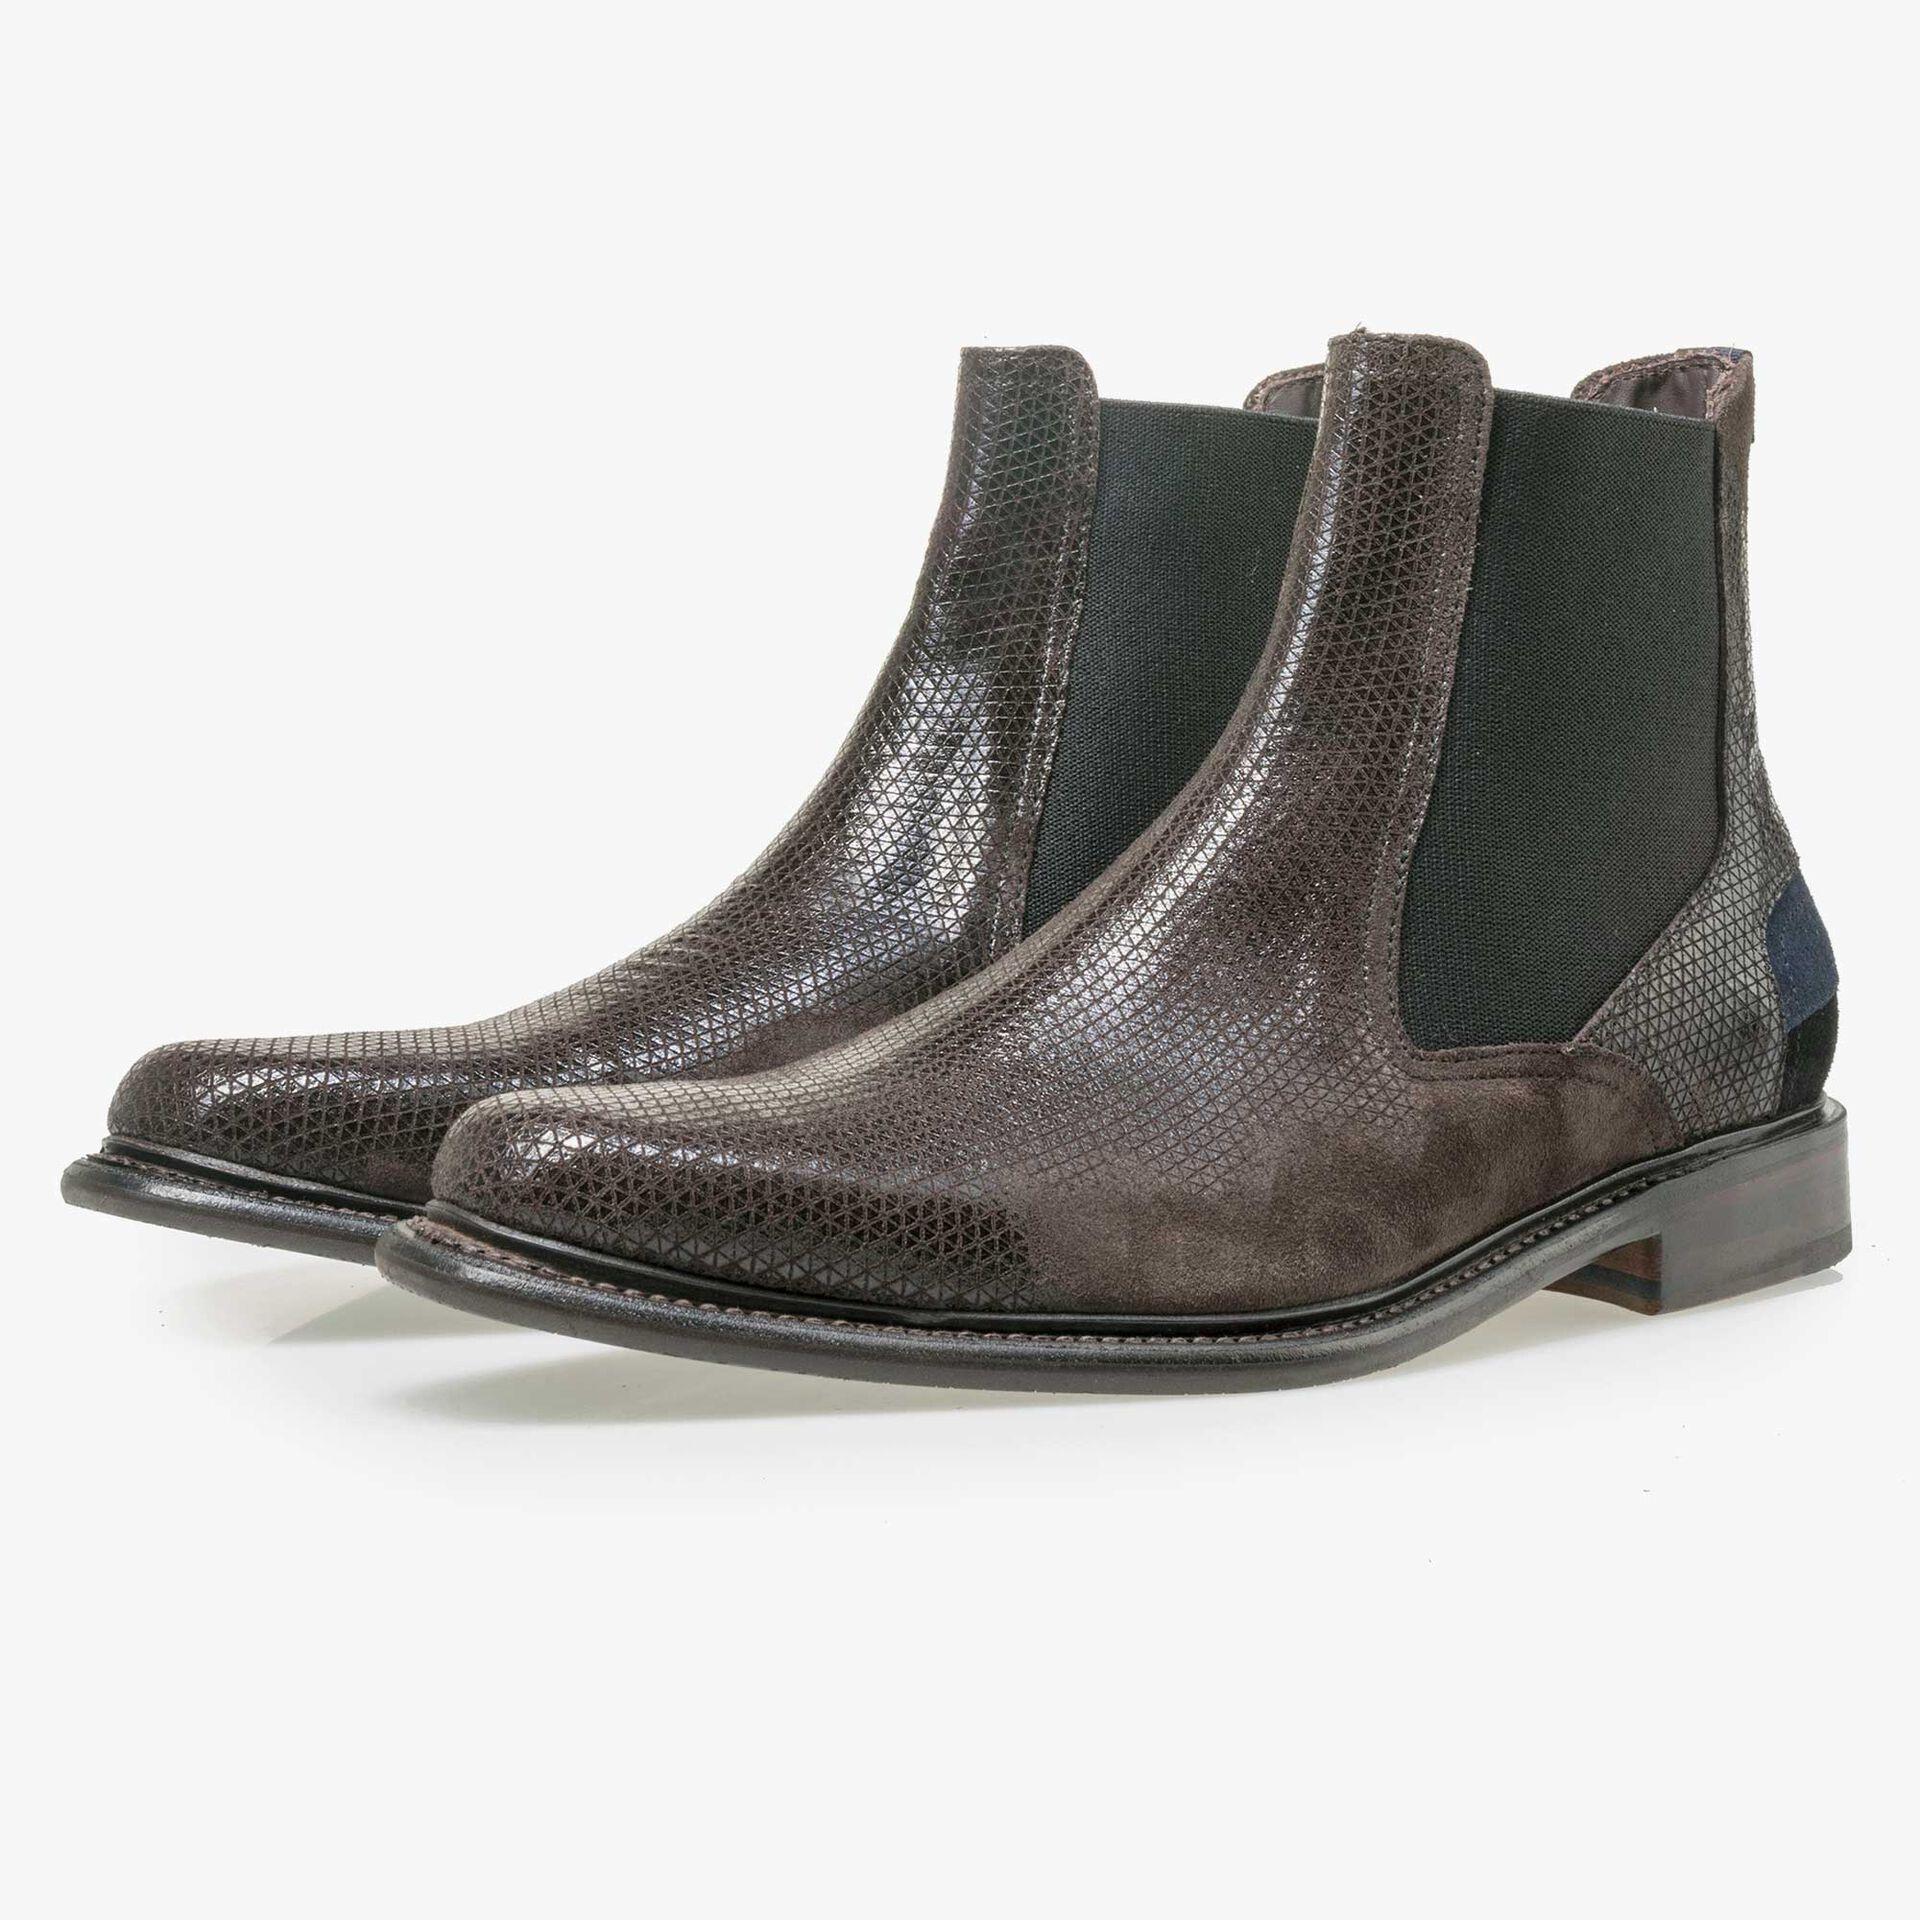 Floris van Bommel men's brown suede leather Chelsea boot